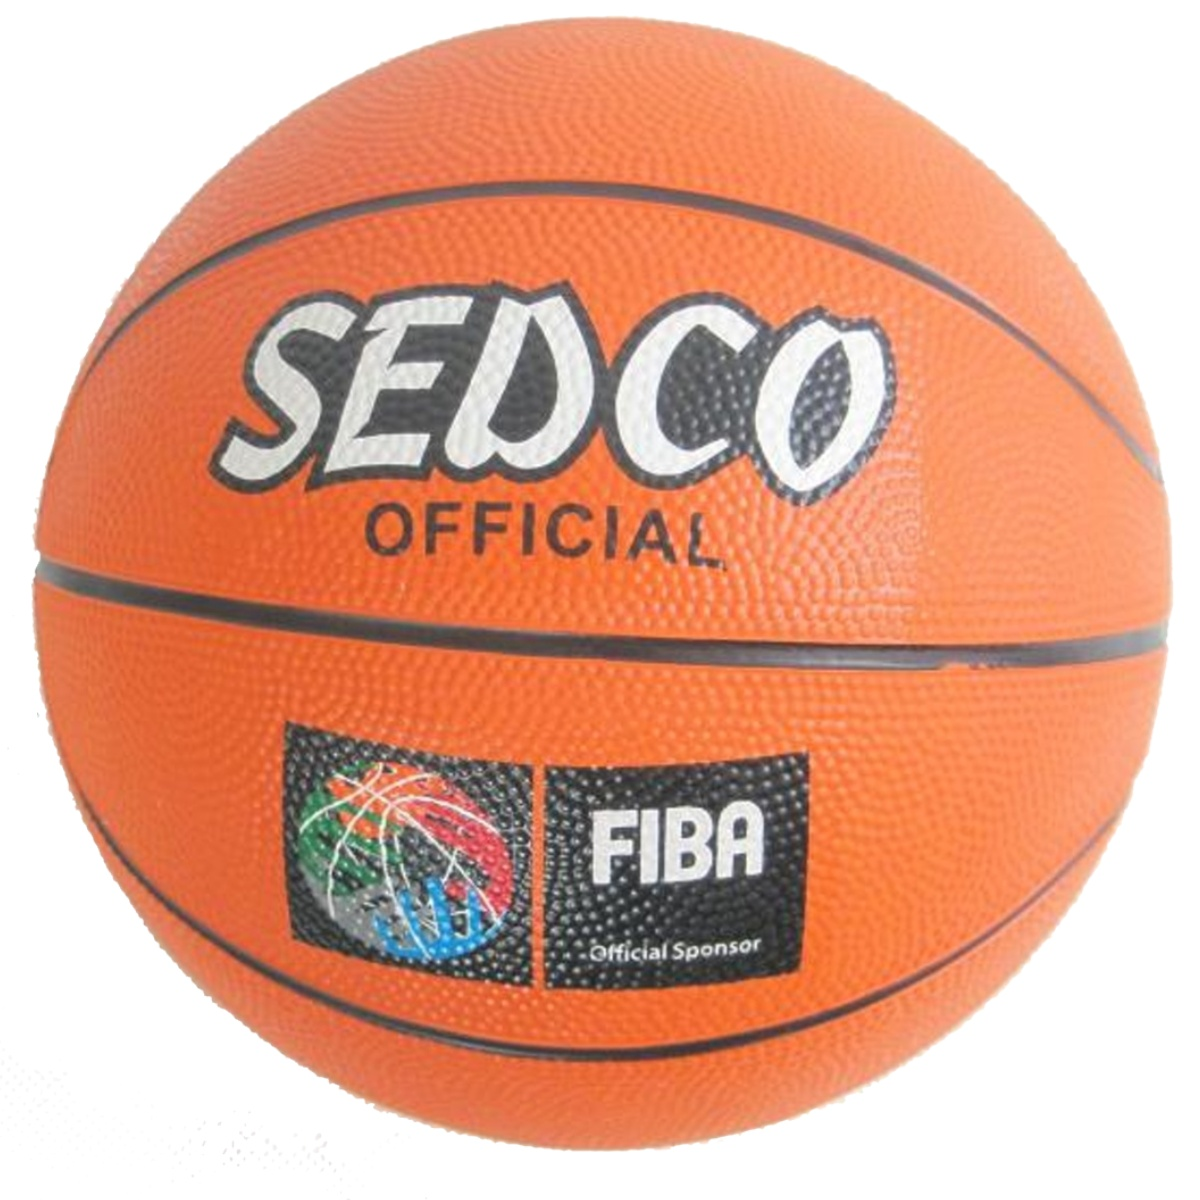 Basketbalový míč SEDCO Orange Super 3